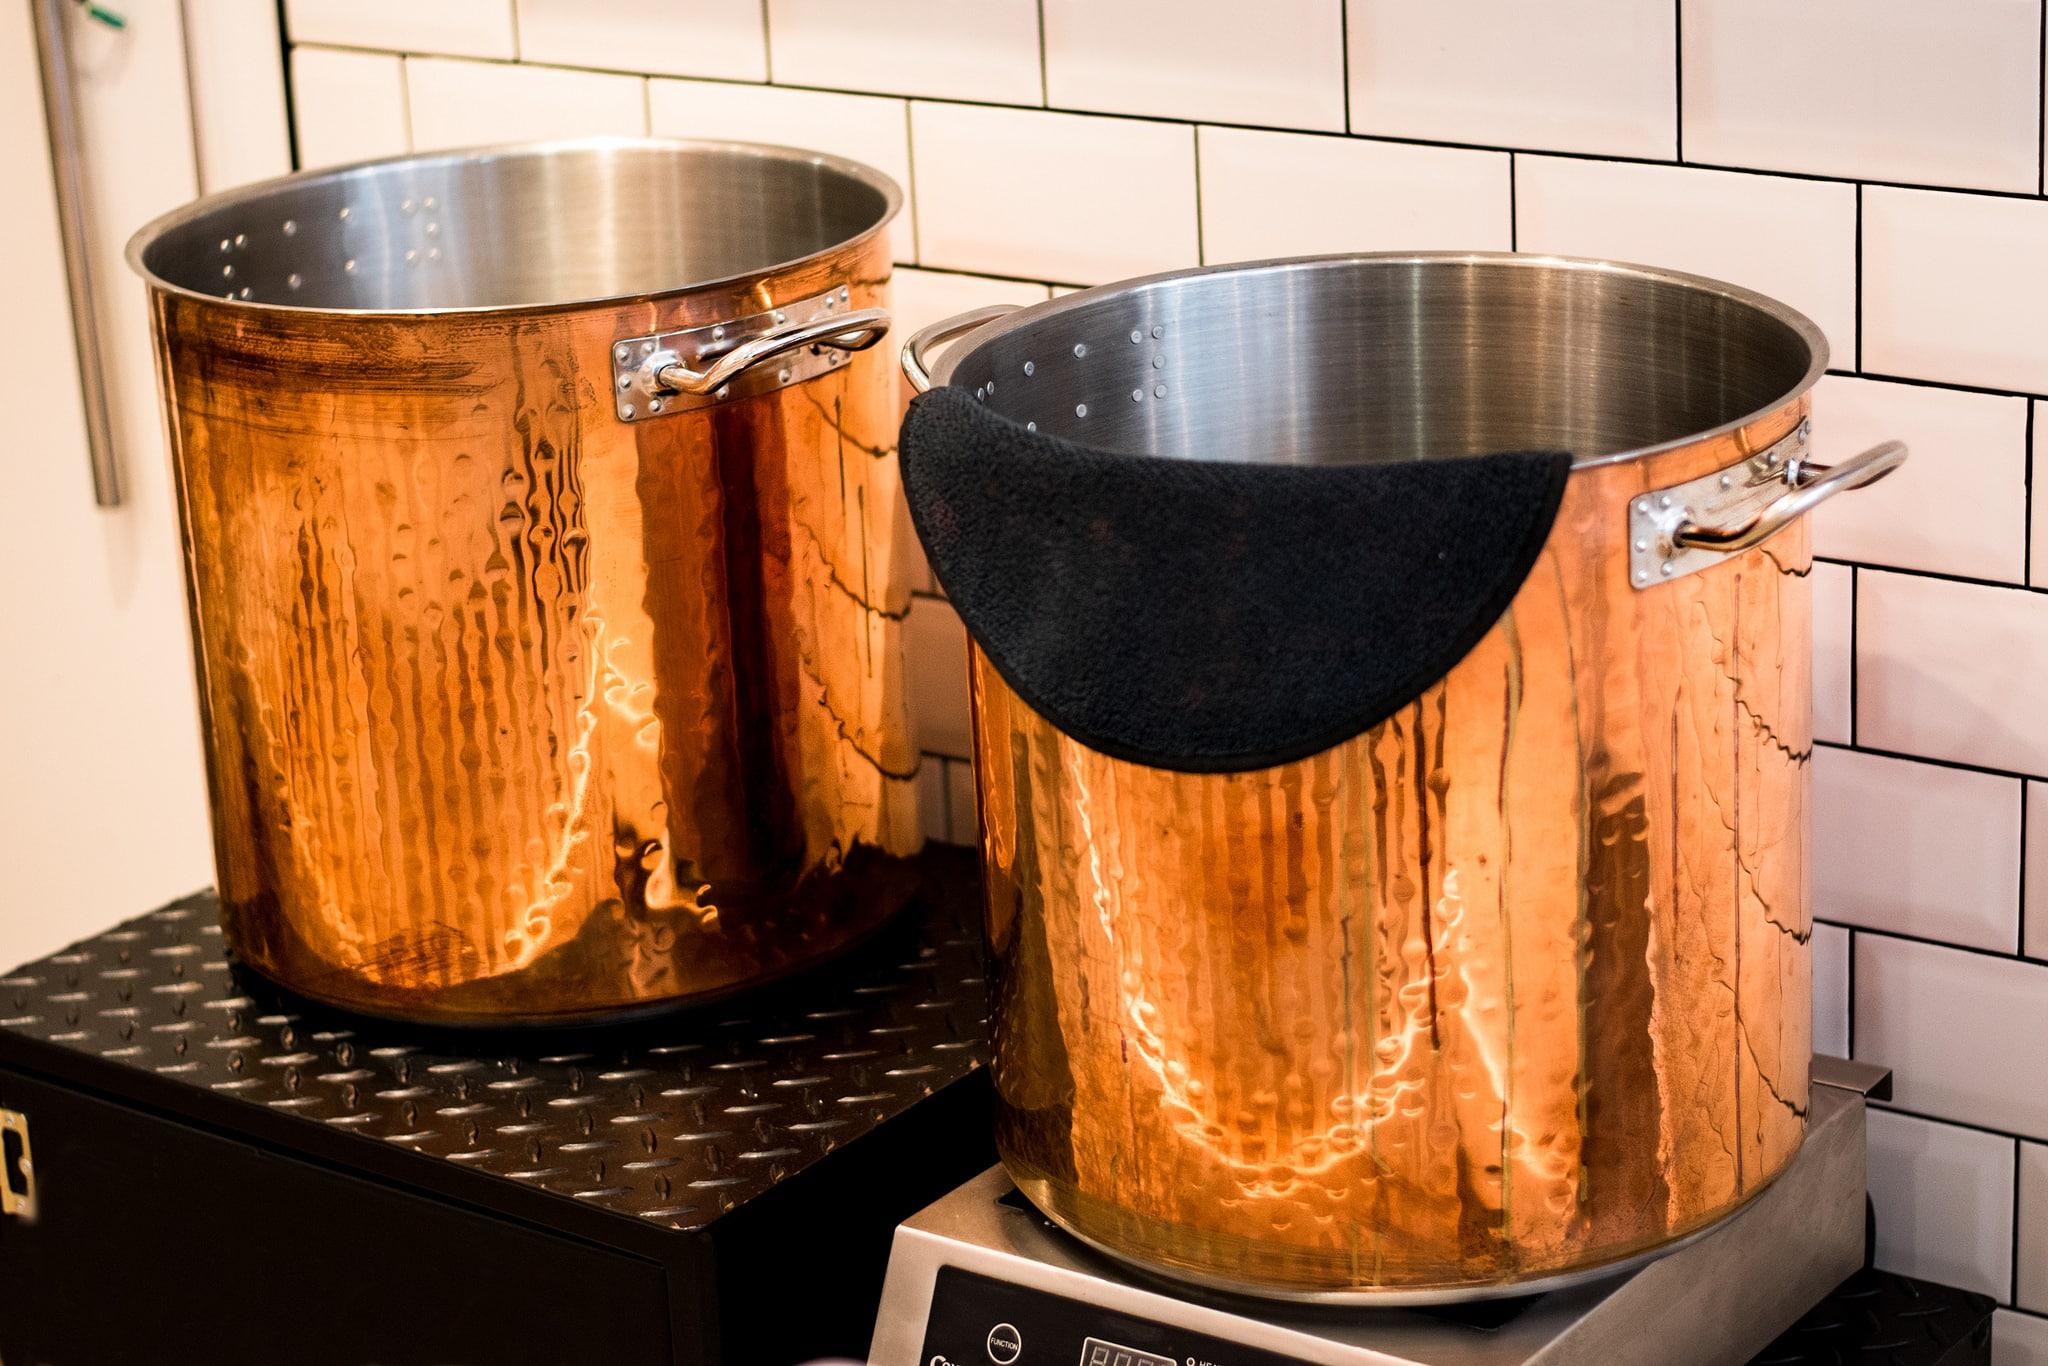 lagostina pot, lagostina pot set